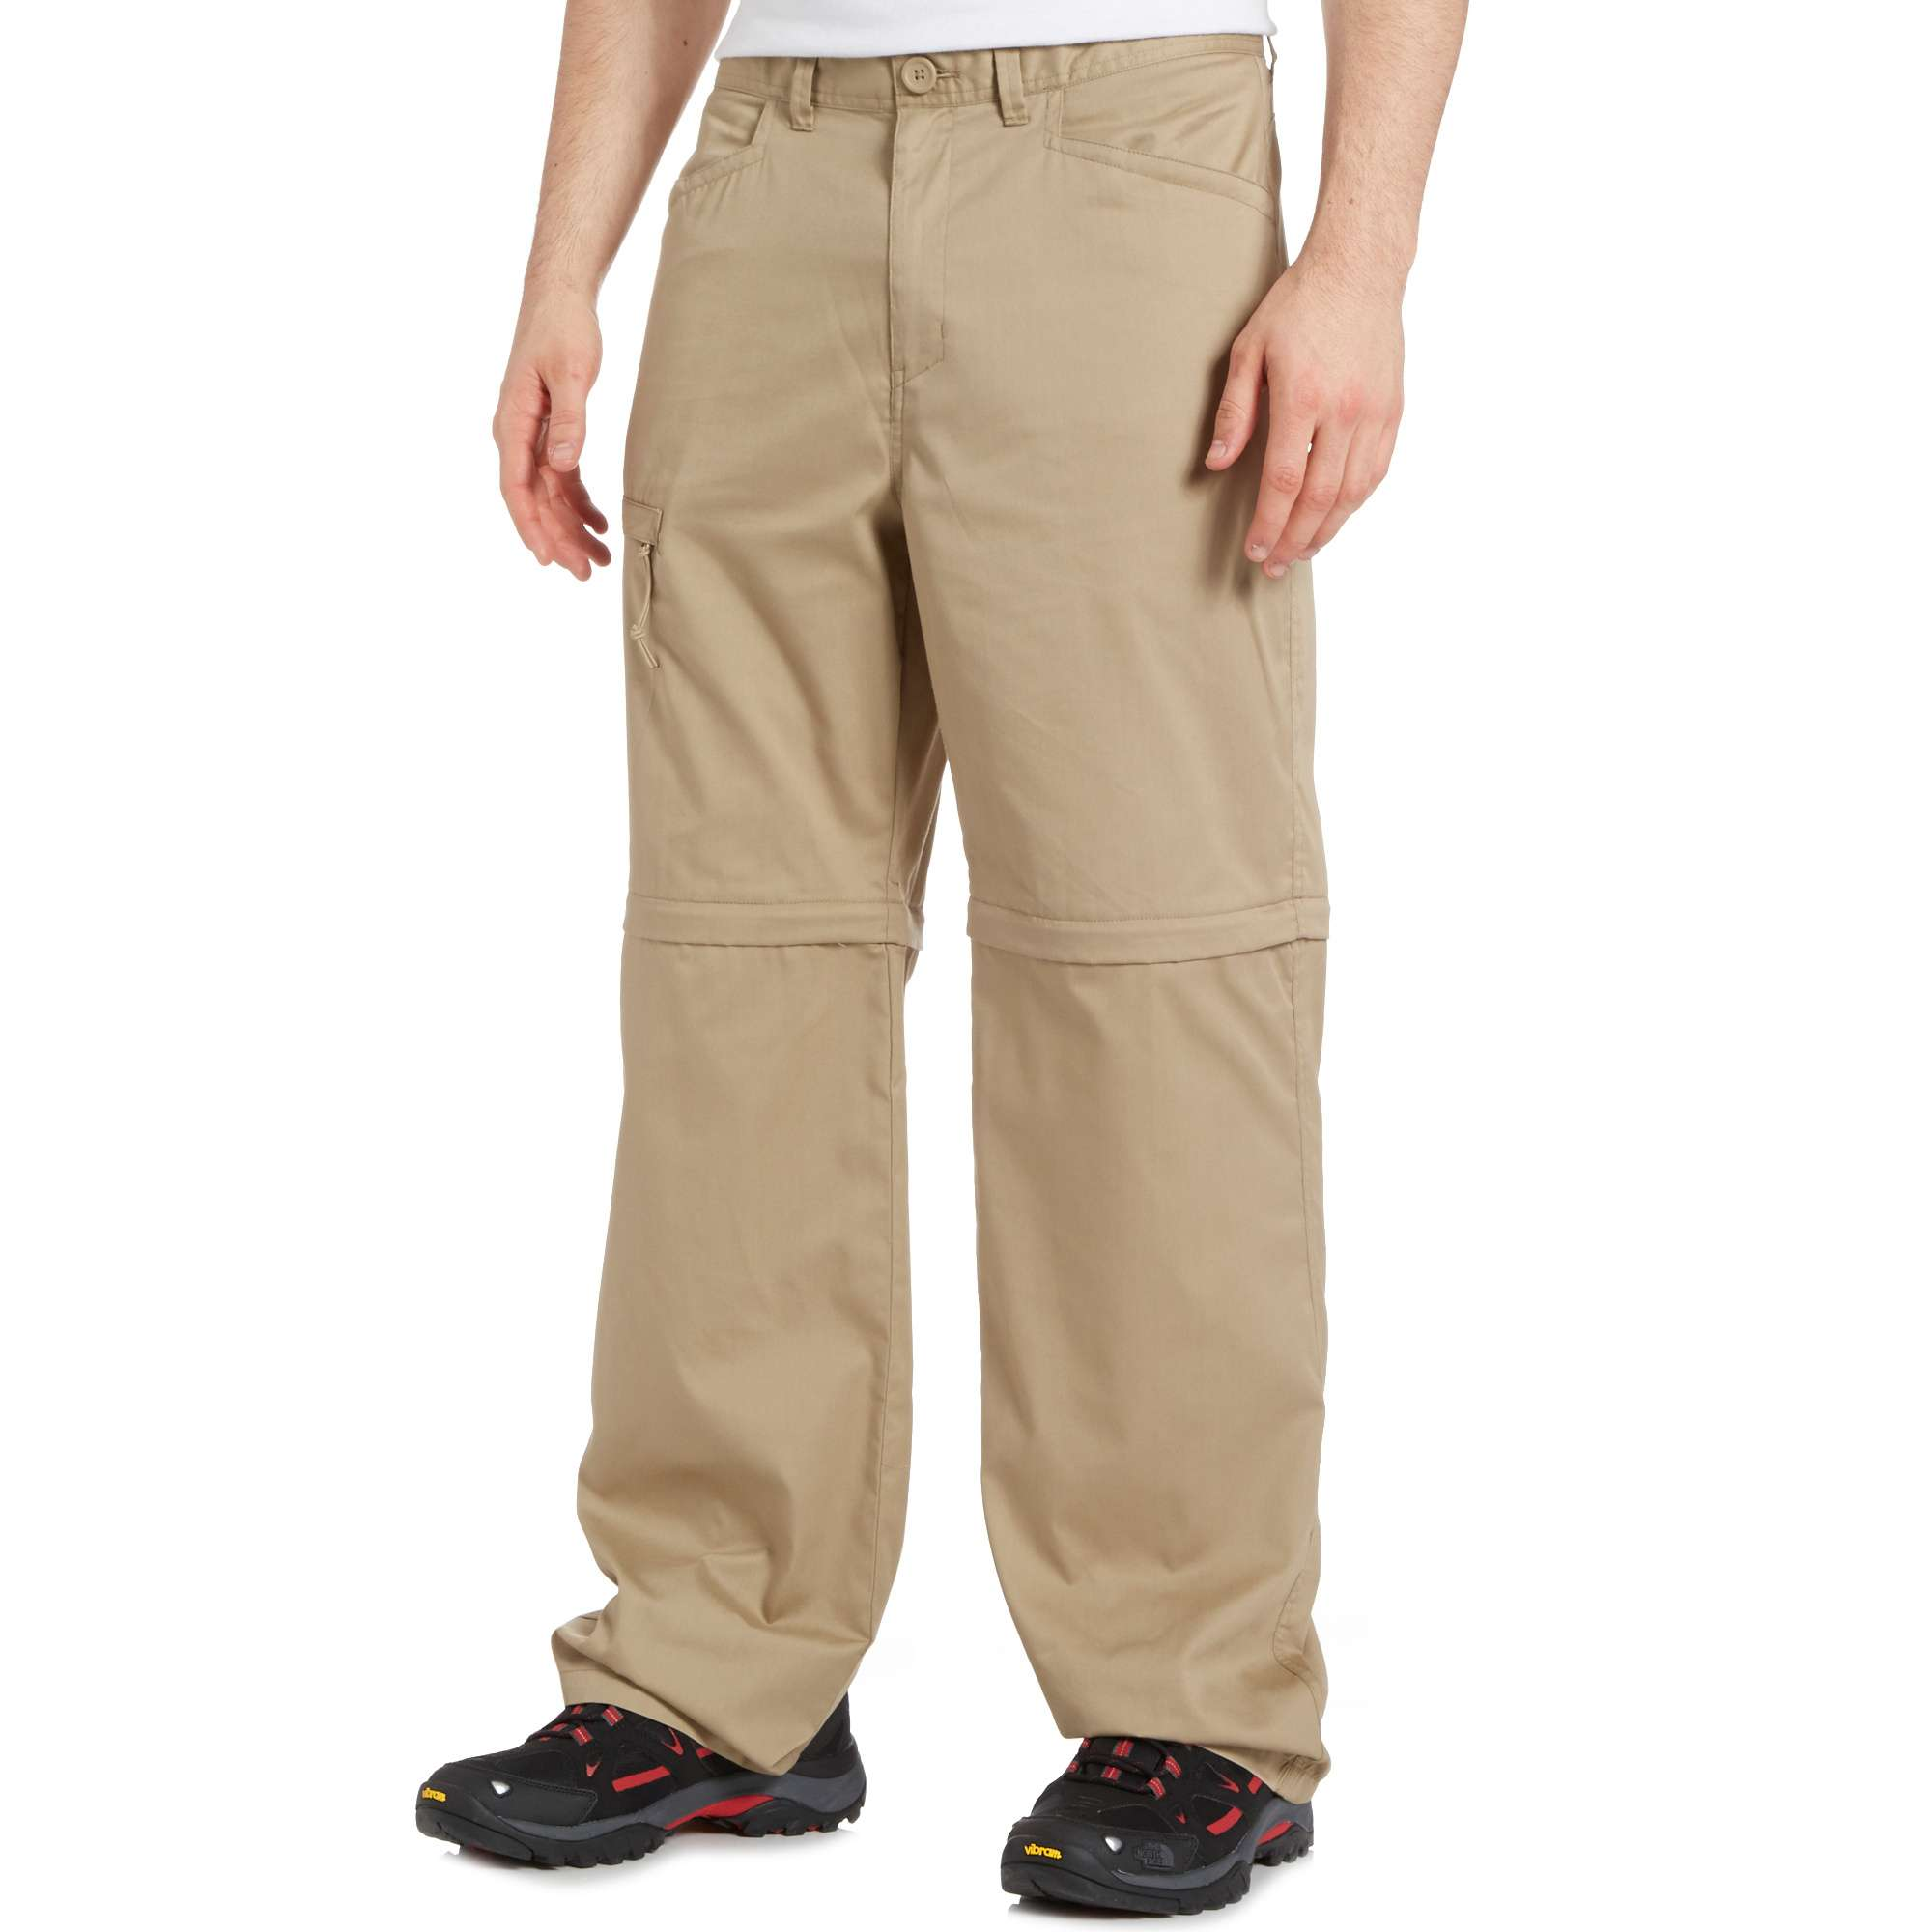 PETER STORM Men's Ramble Convertible Trousers - Regular